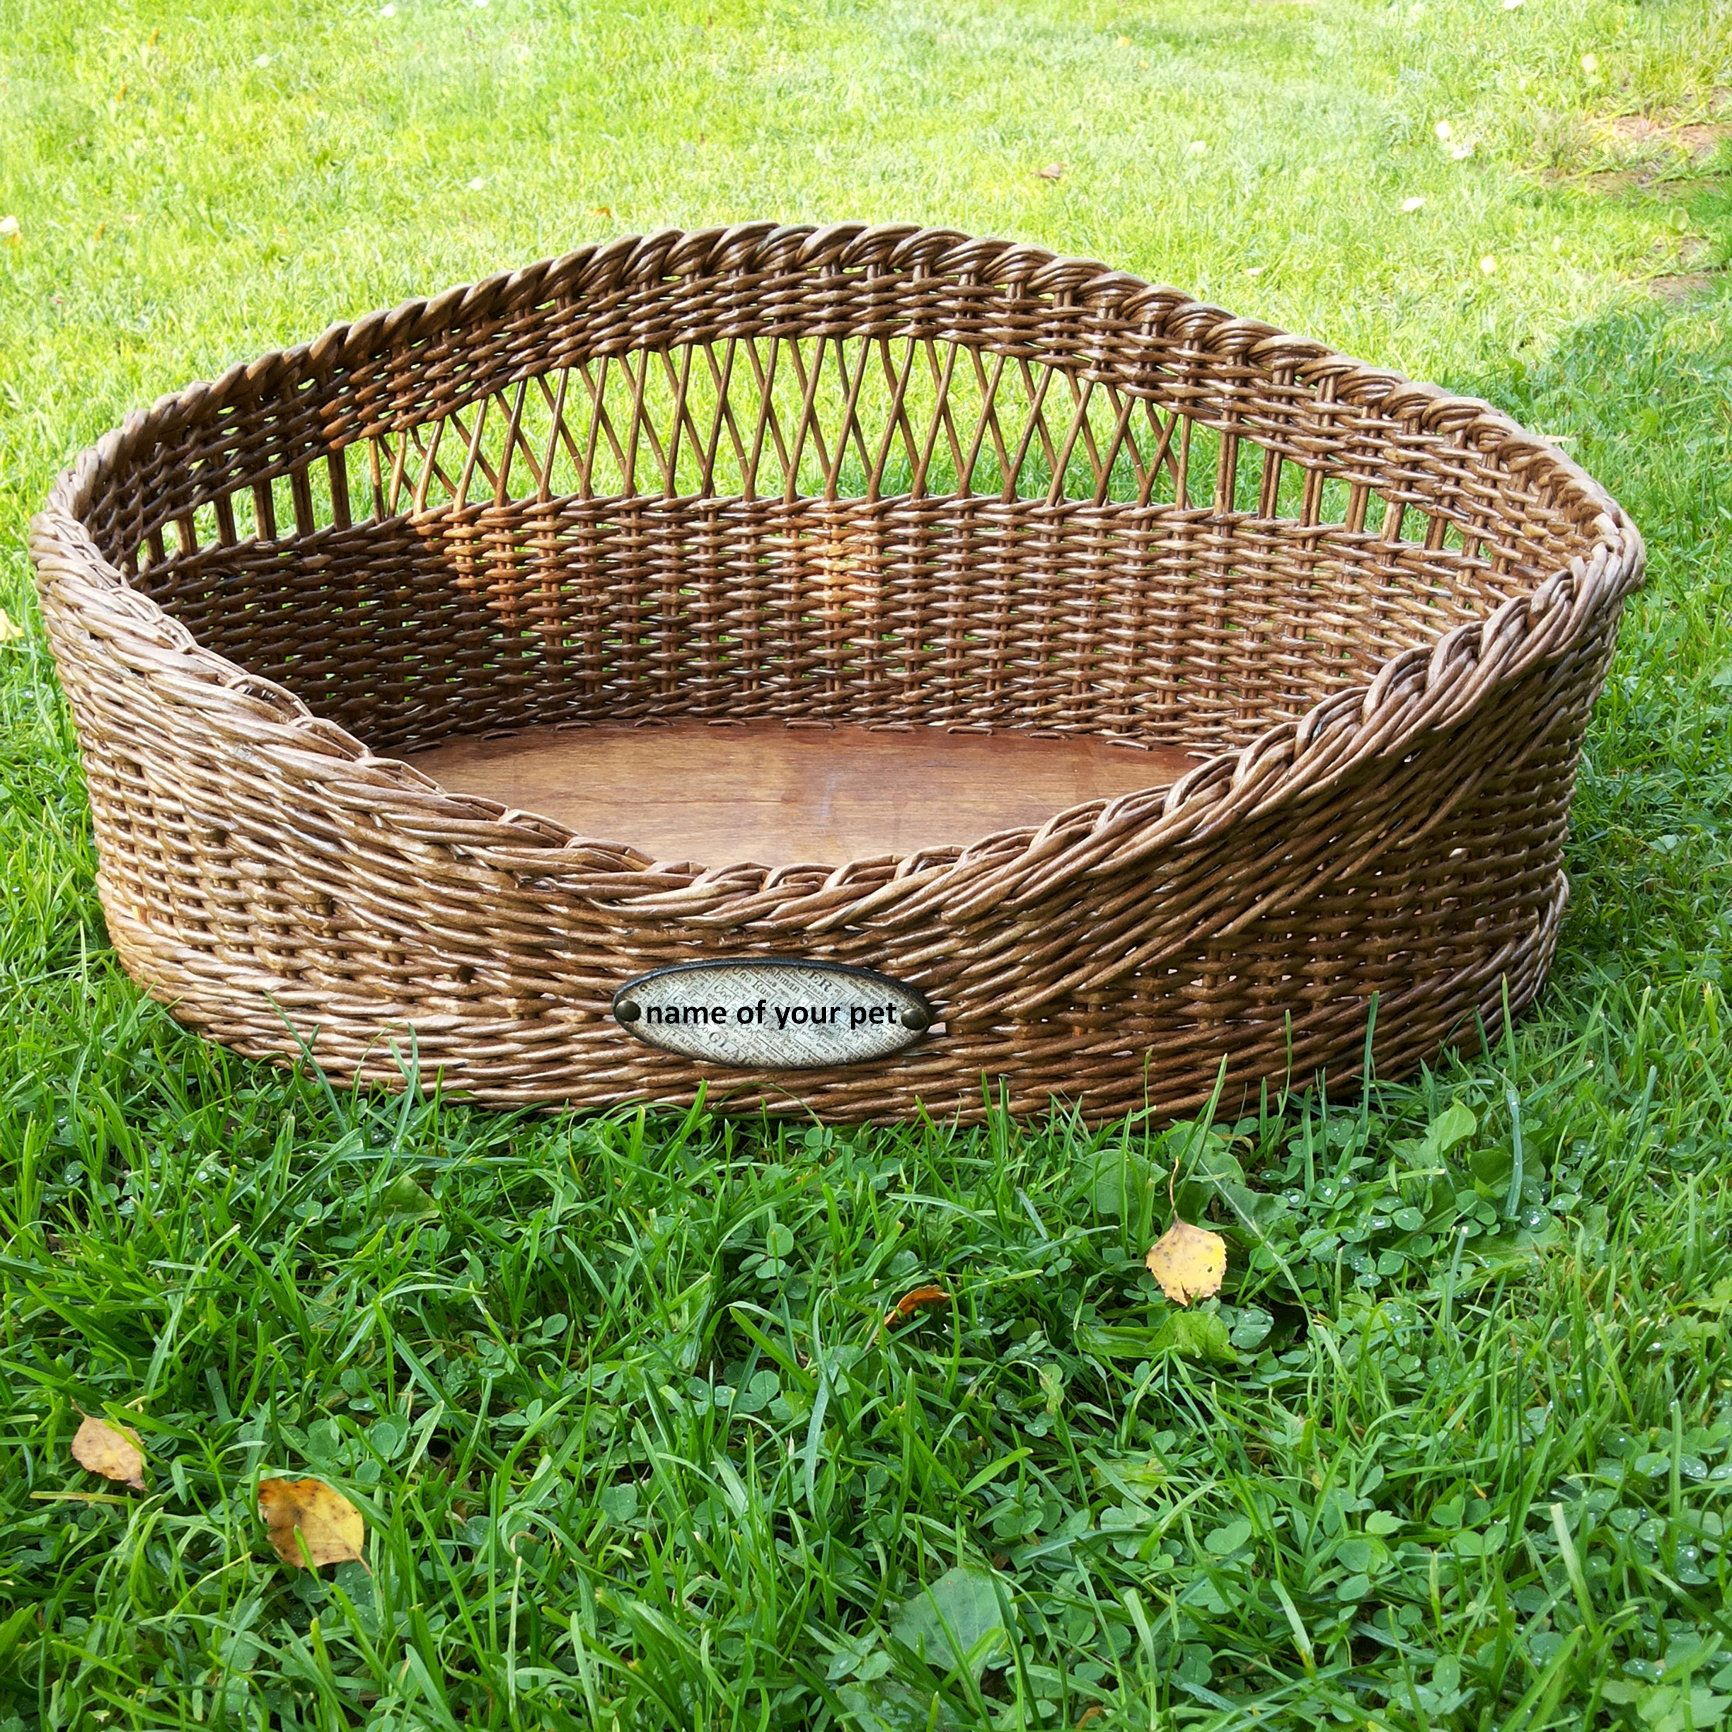 Personalized Wicker dog bed pet basket cat furniture Pet